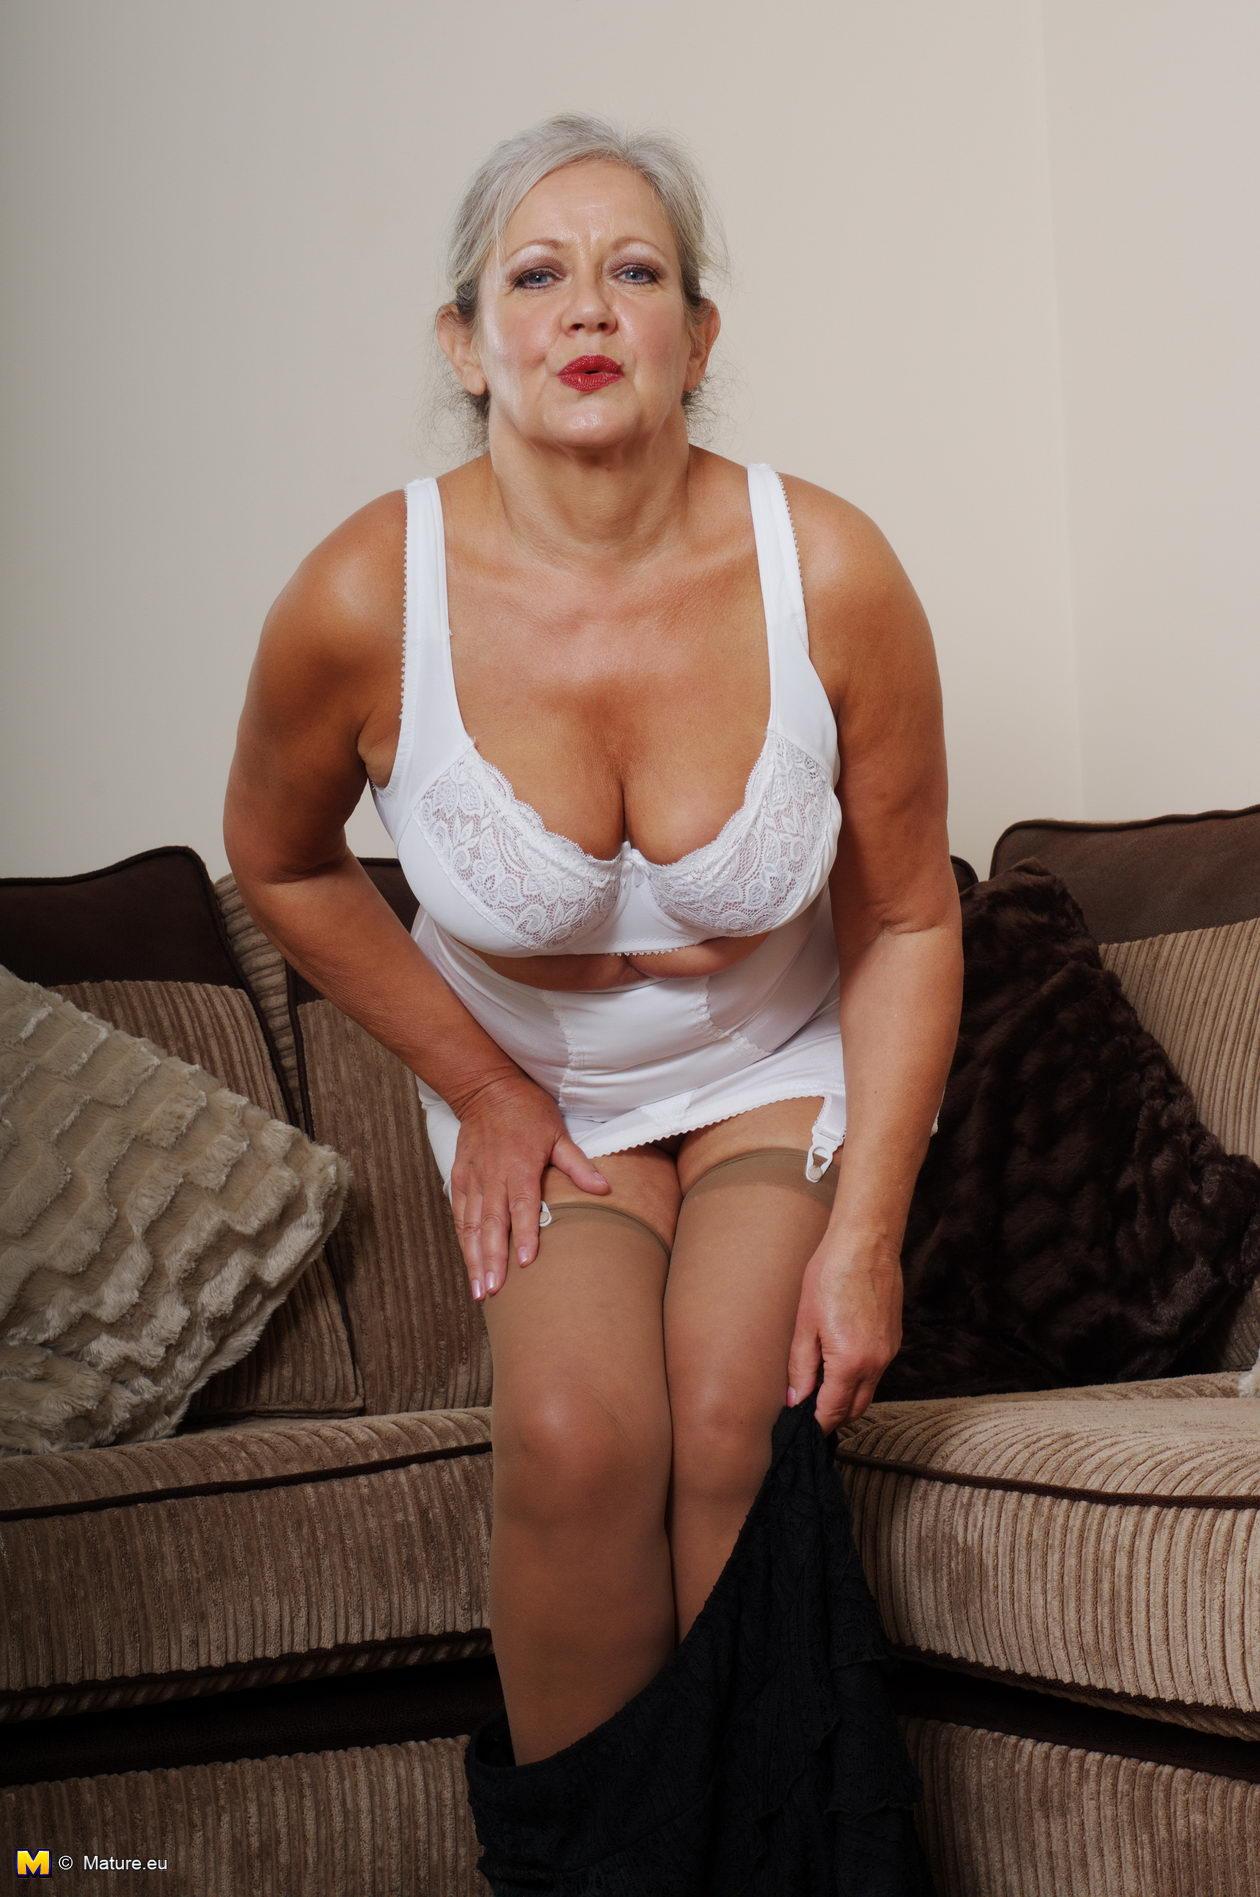 naughty mature slut getting very dirty bu herself - grannypornpics